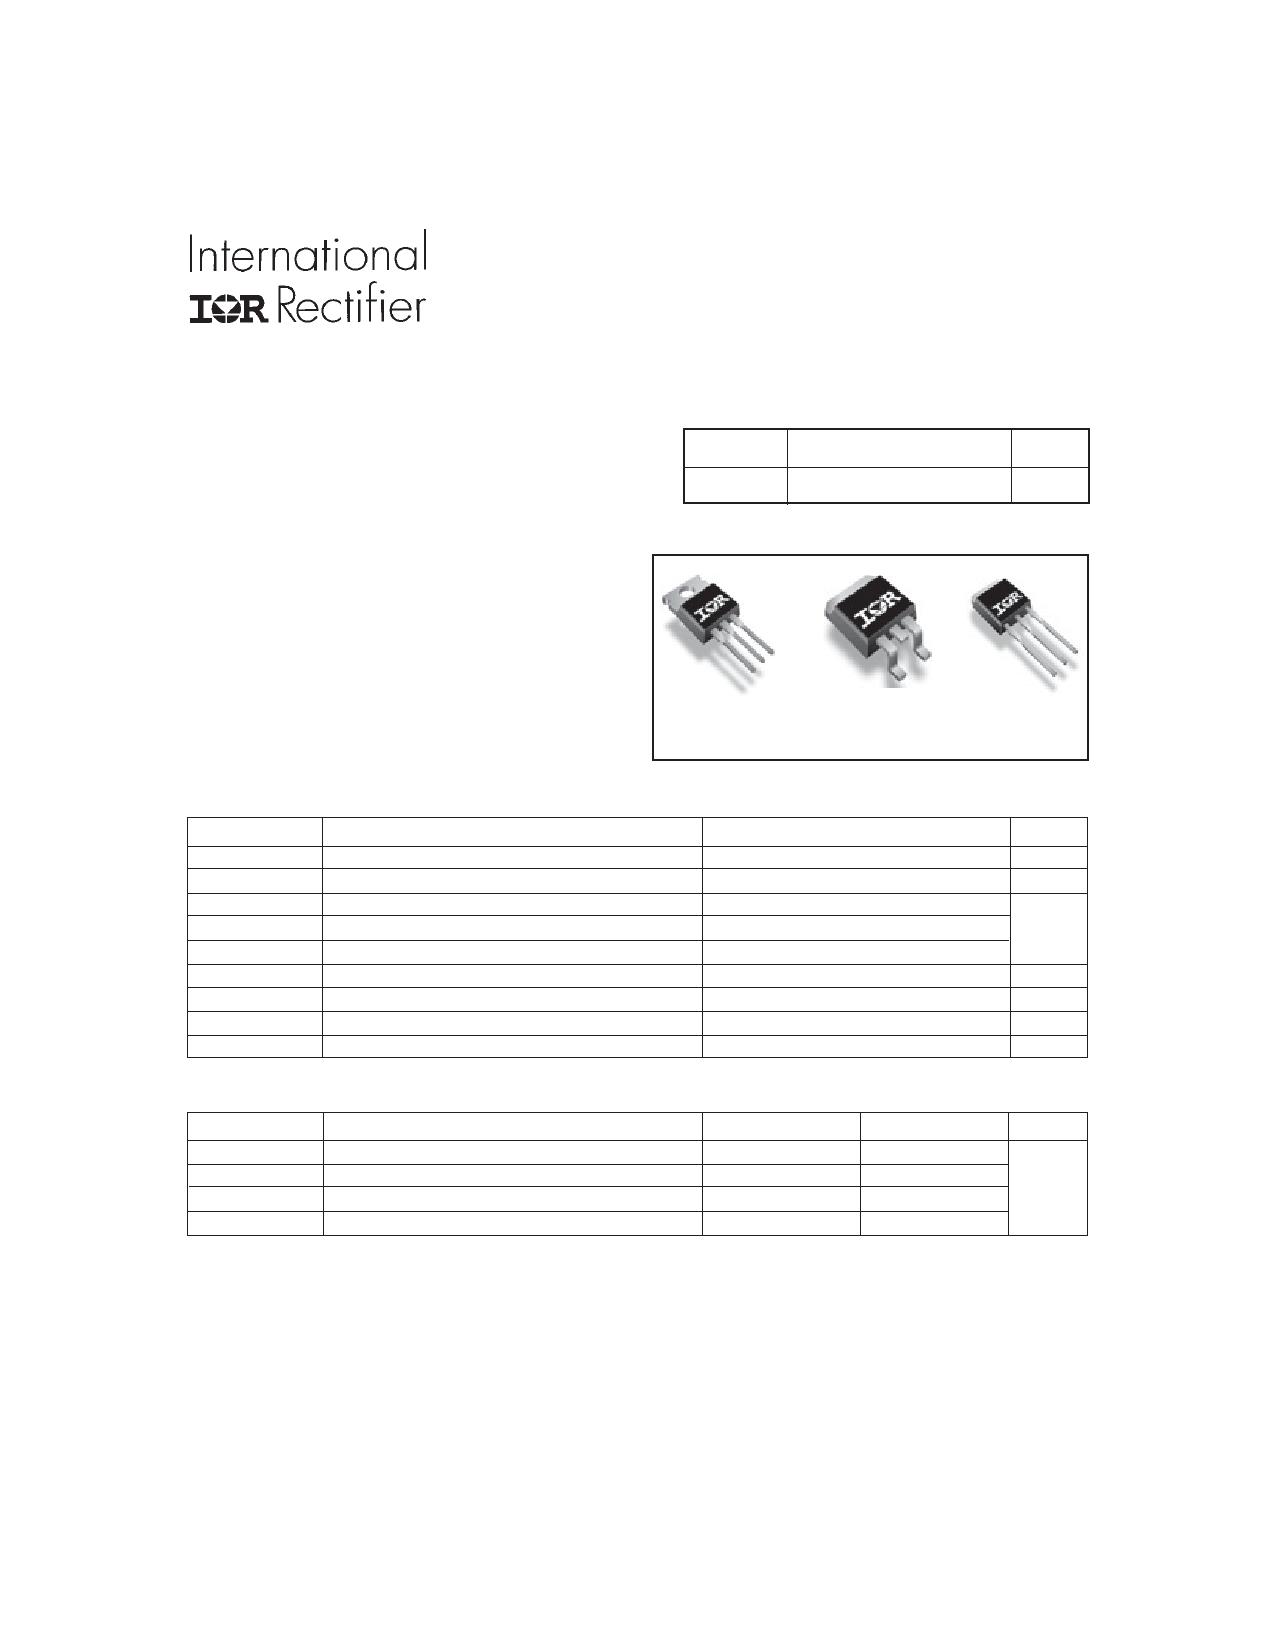 IRL3716SPbF Datasheet, IRL3716SPbF PDF,ピン配置, 機能